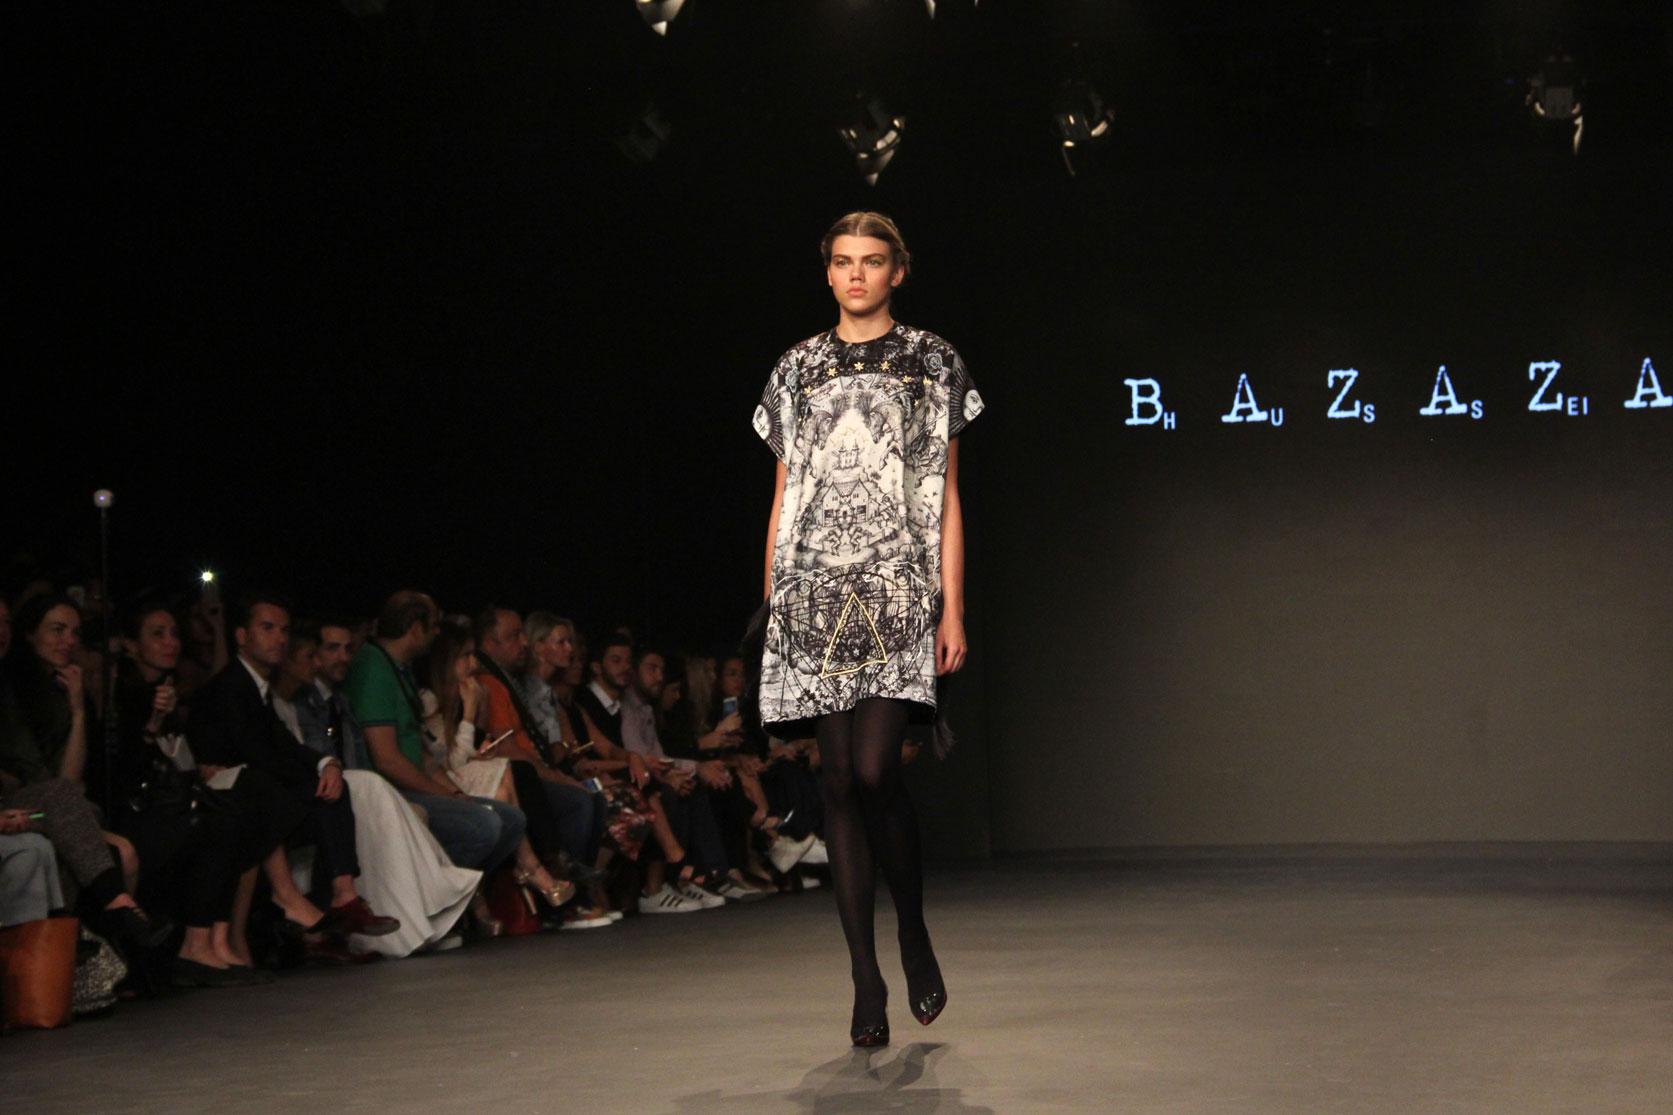 Hussein Bazaza Printed Dress 2016